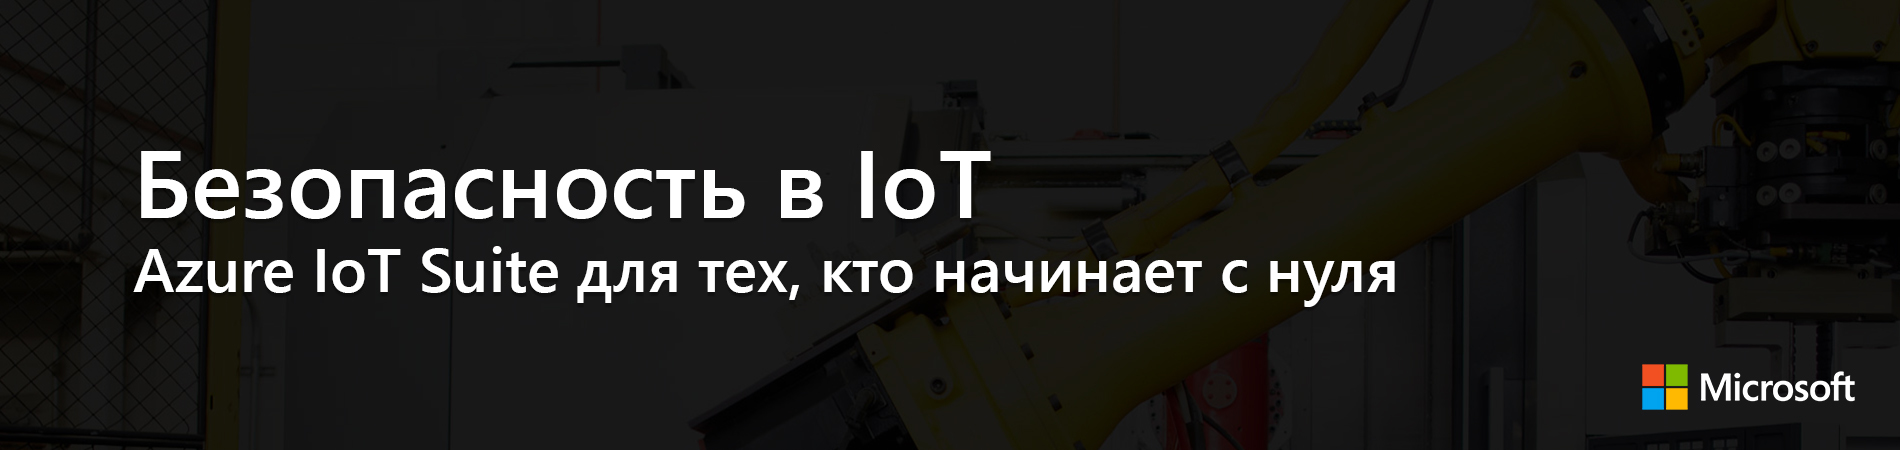 ������������ � IoT: Azure IoT Suite ��� ���, ��� �������� � ����